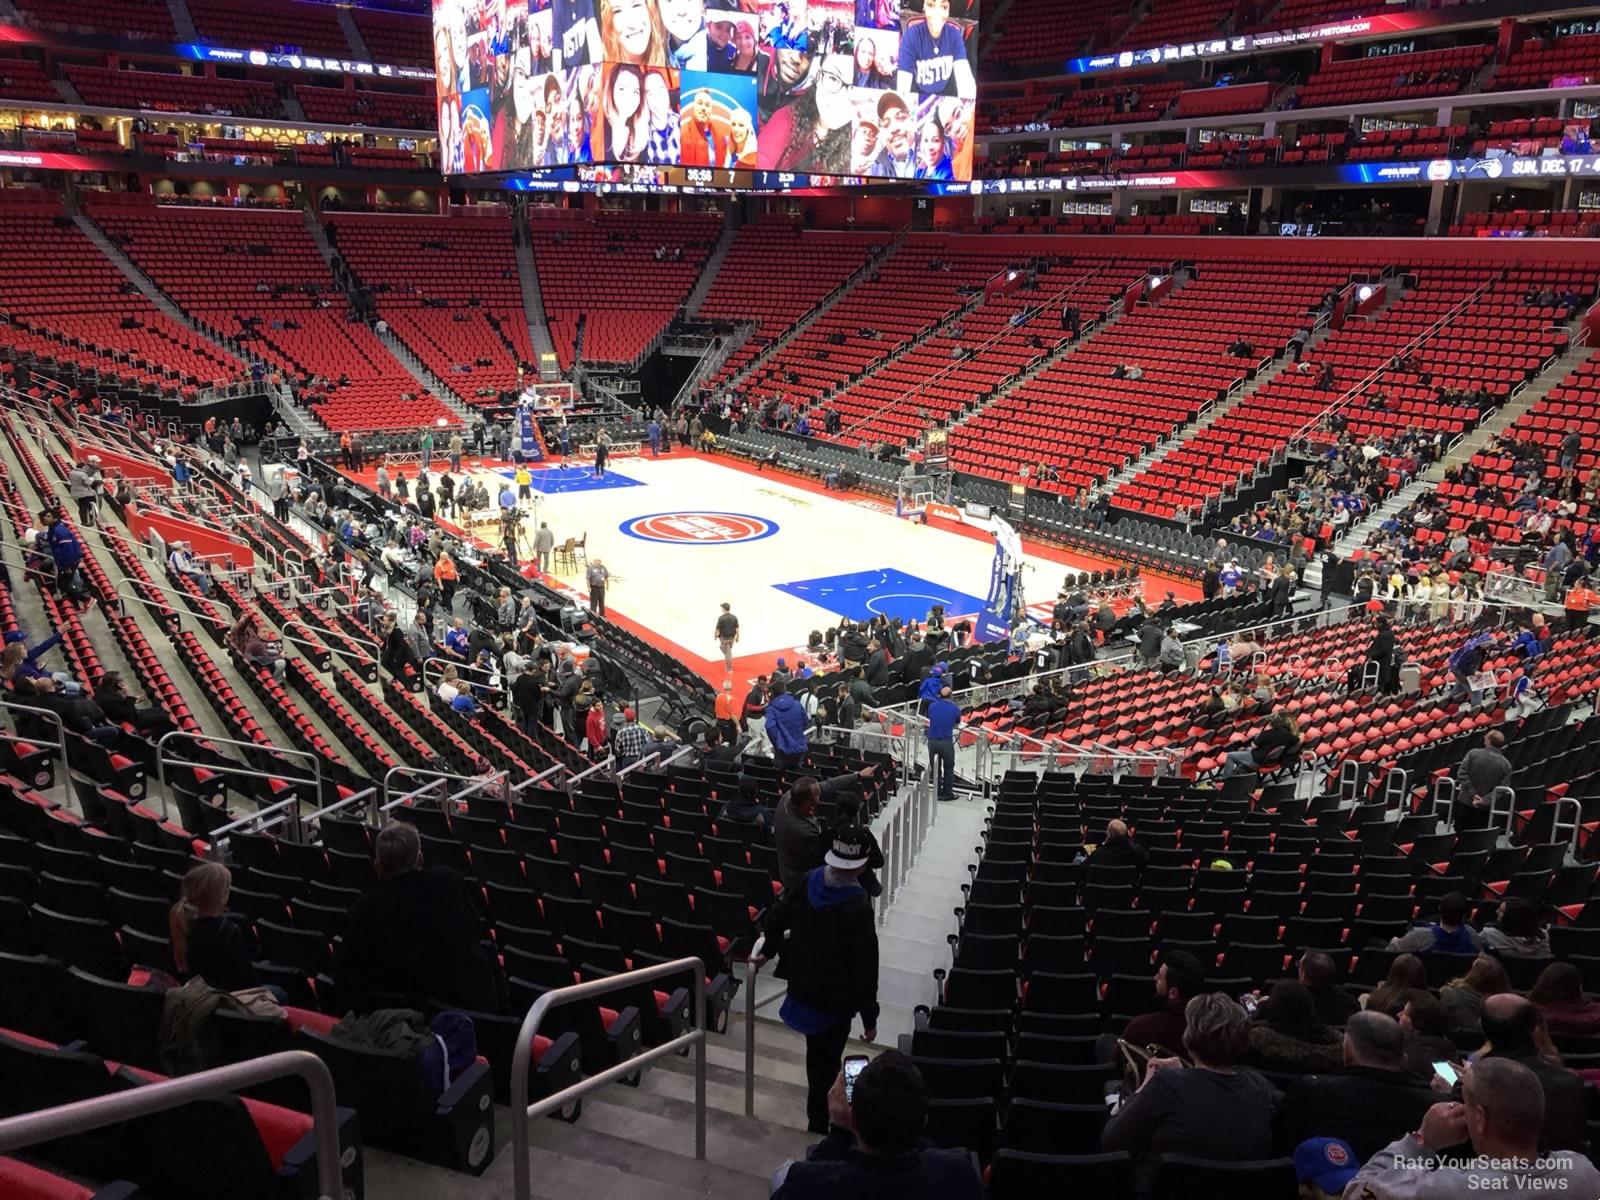 Little Caesars Arena Section 117 - Detroit Pistons - RateYourSeats.com